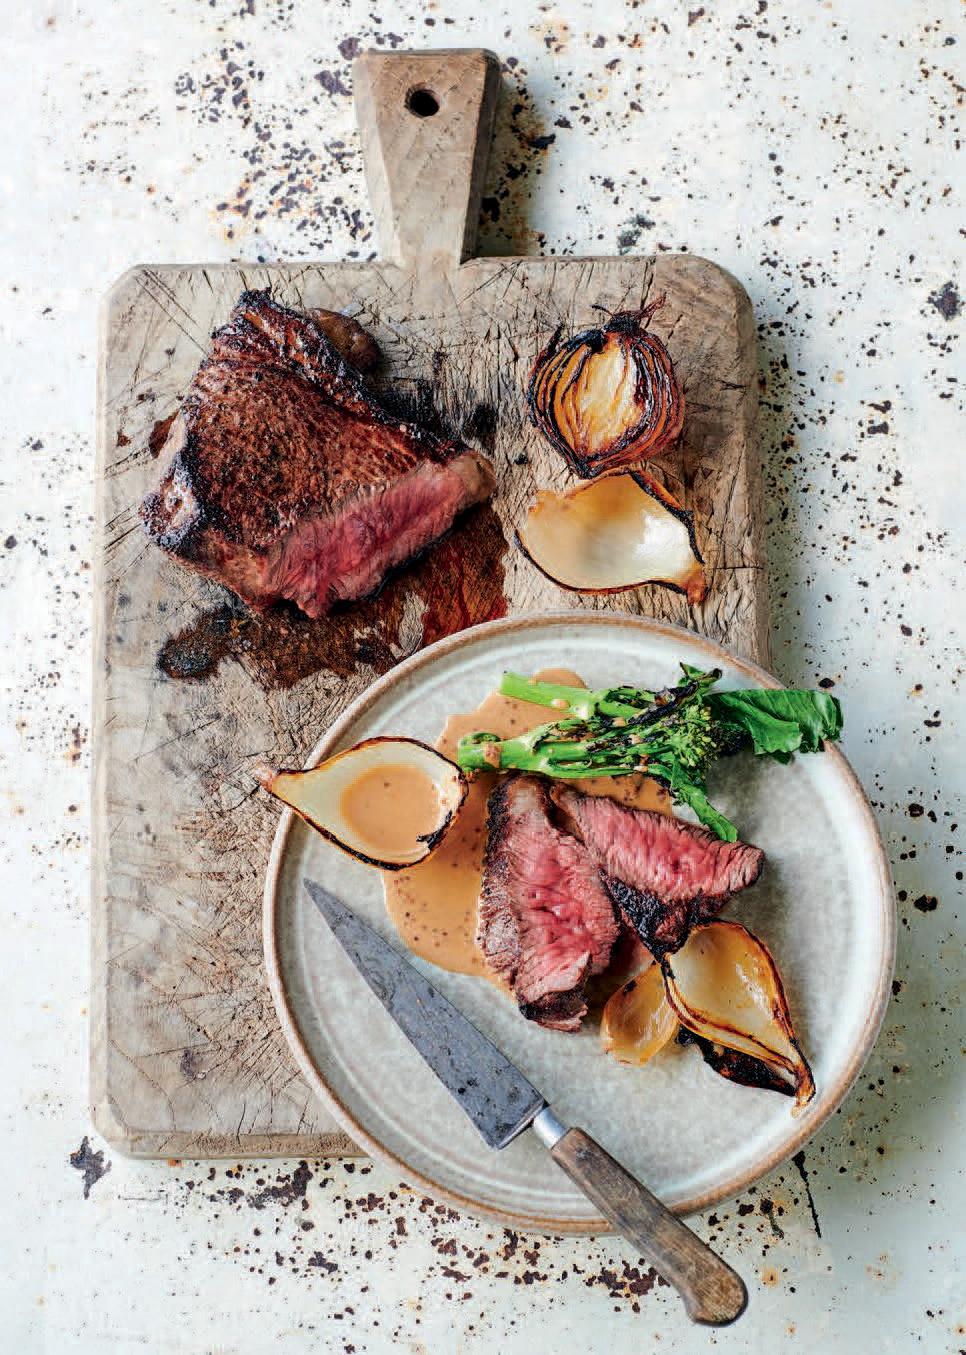 Steak image